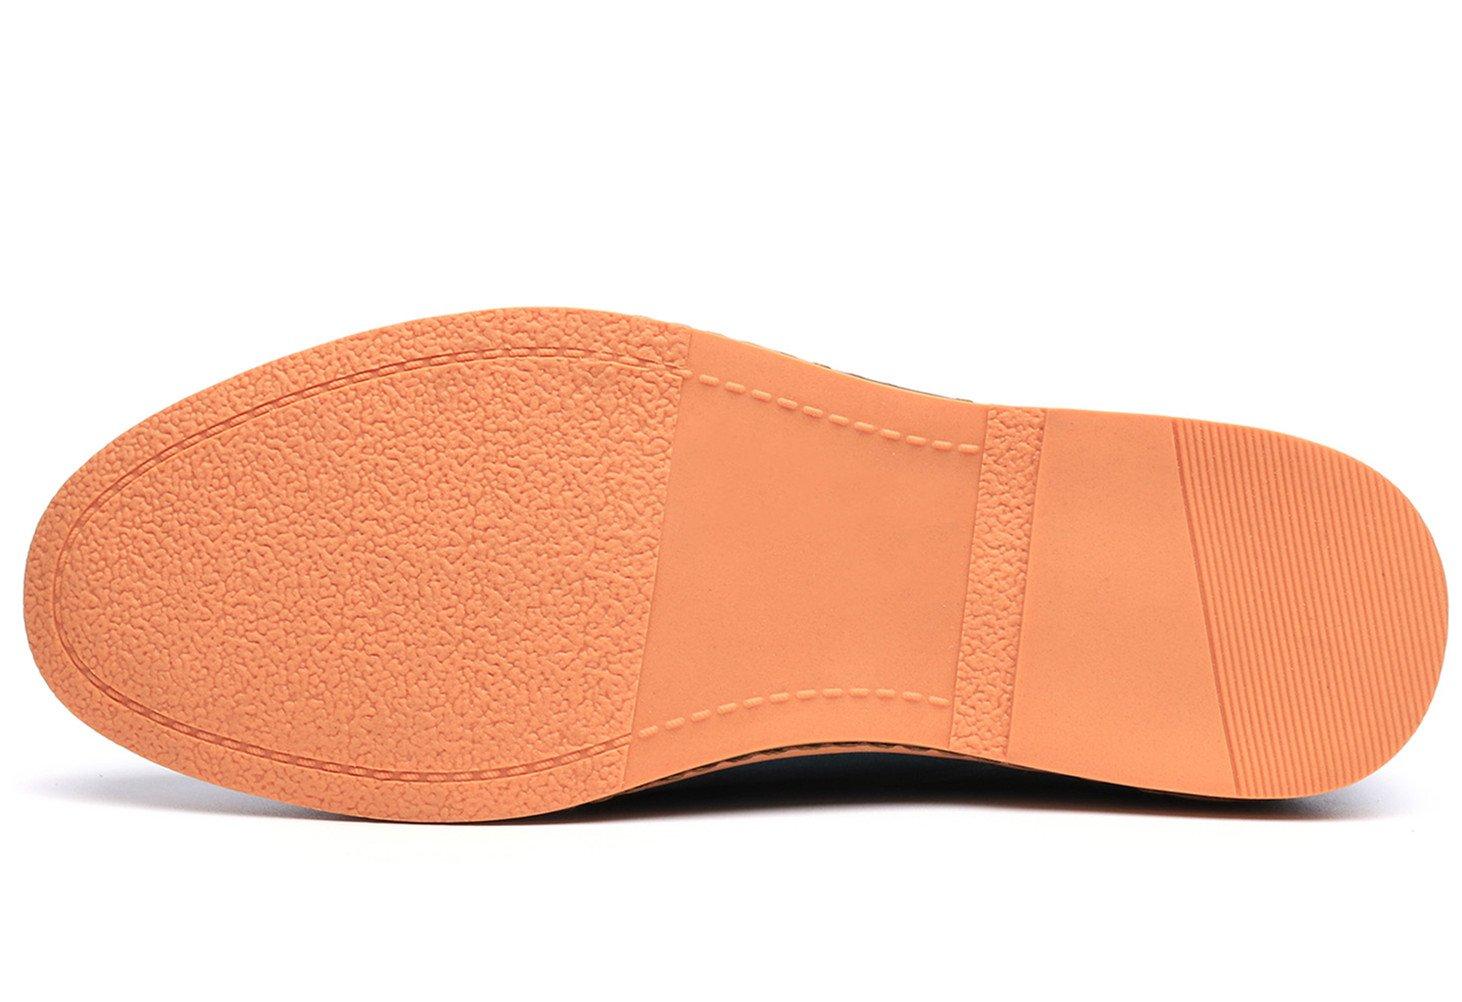 Dadawen Men's Brown Leather Oxford Shoe - 11 D(M) US by DADAWEN (Image #7)